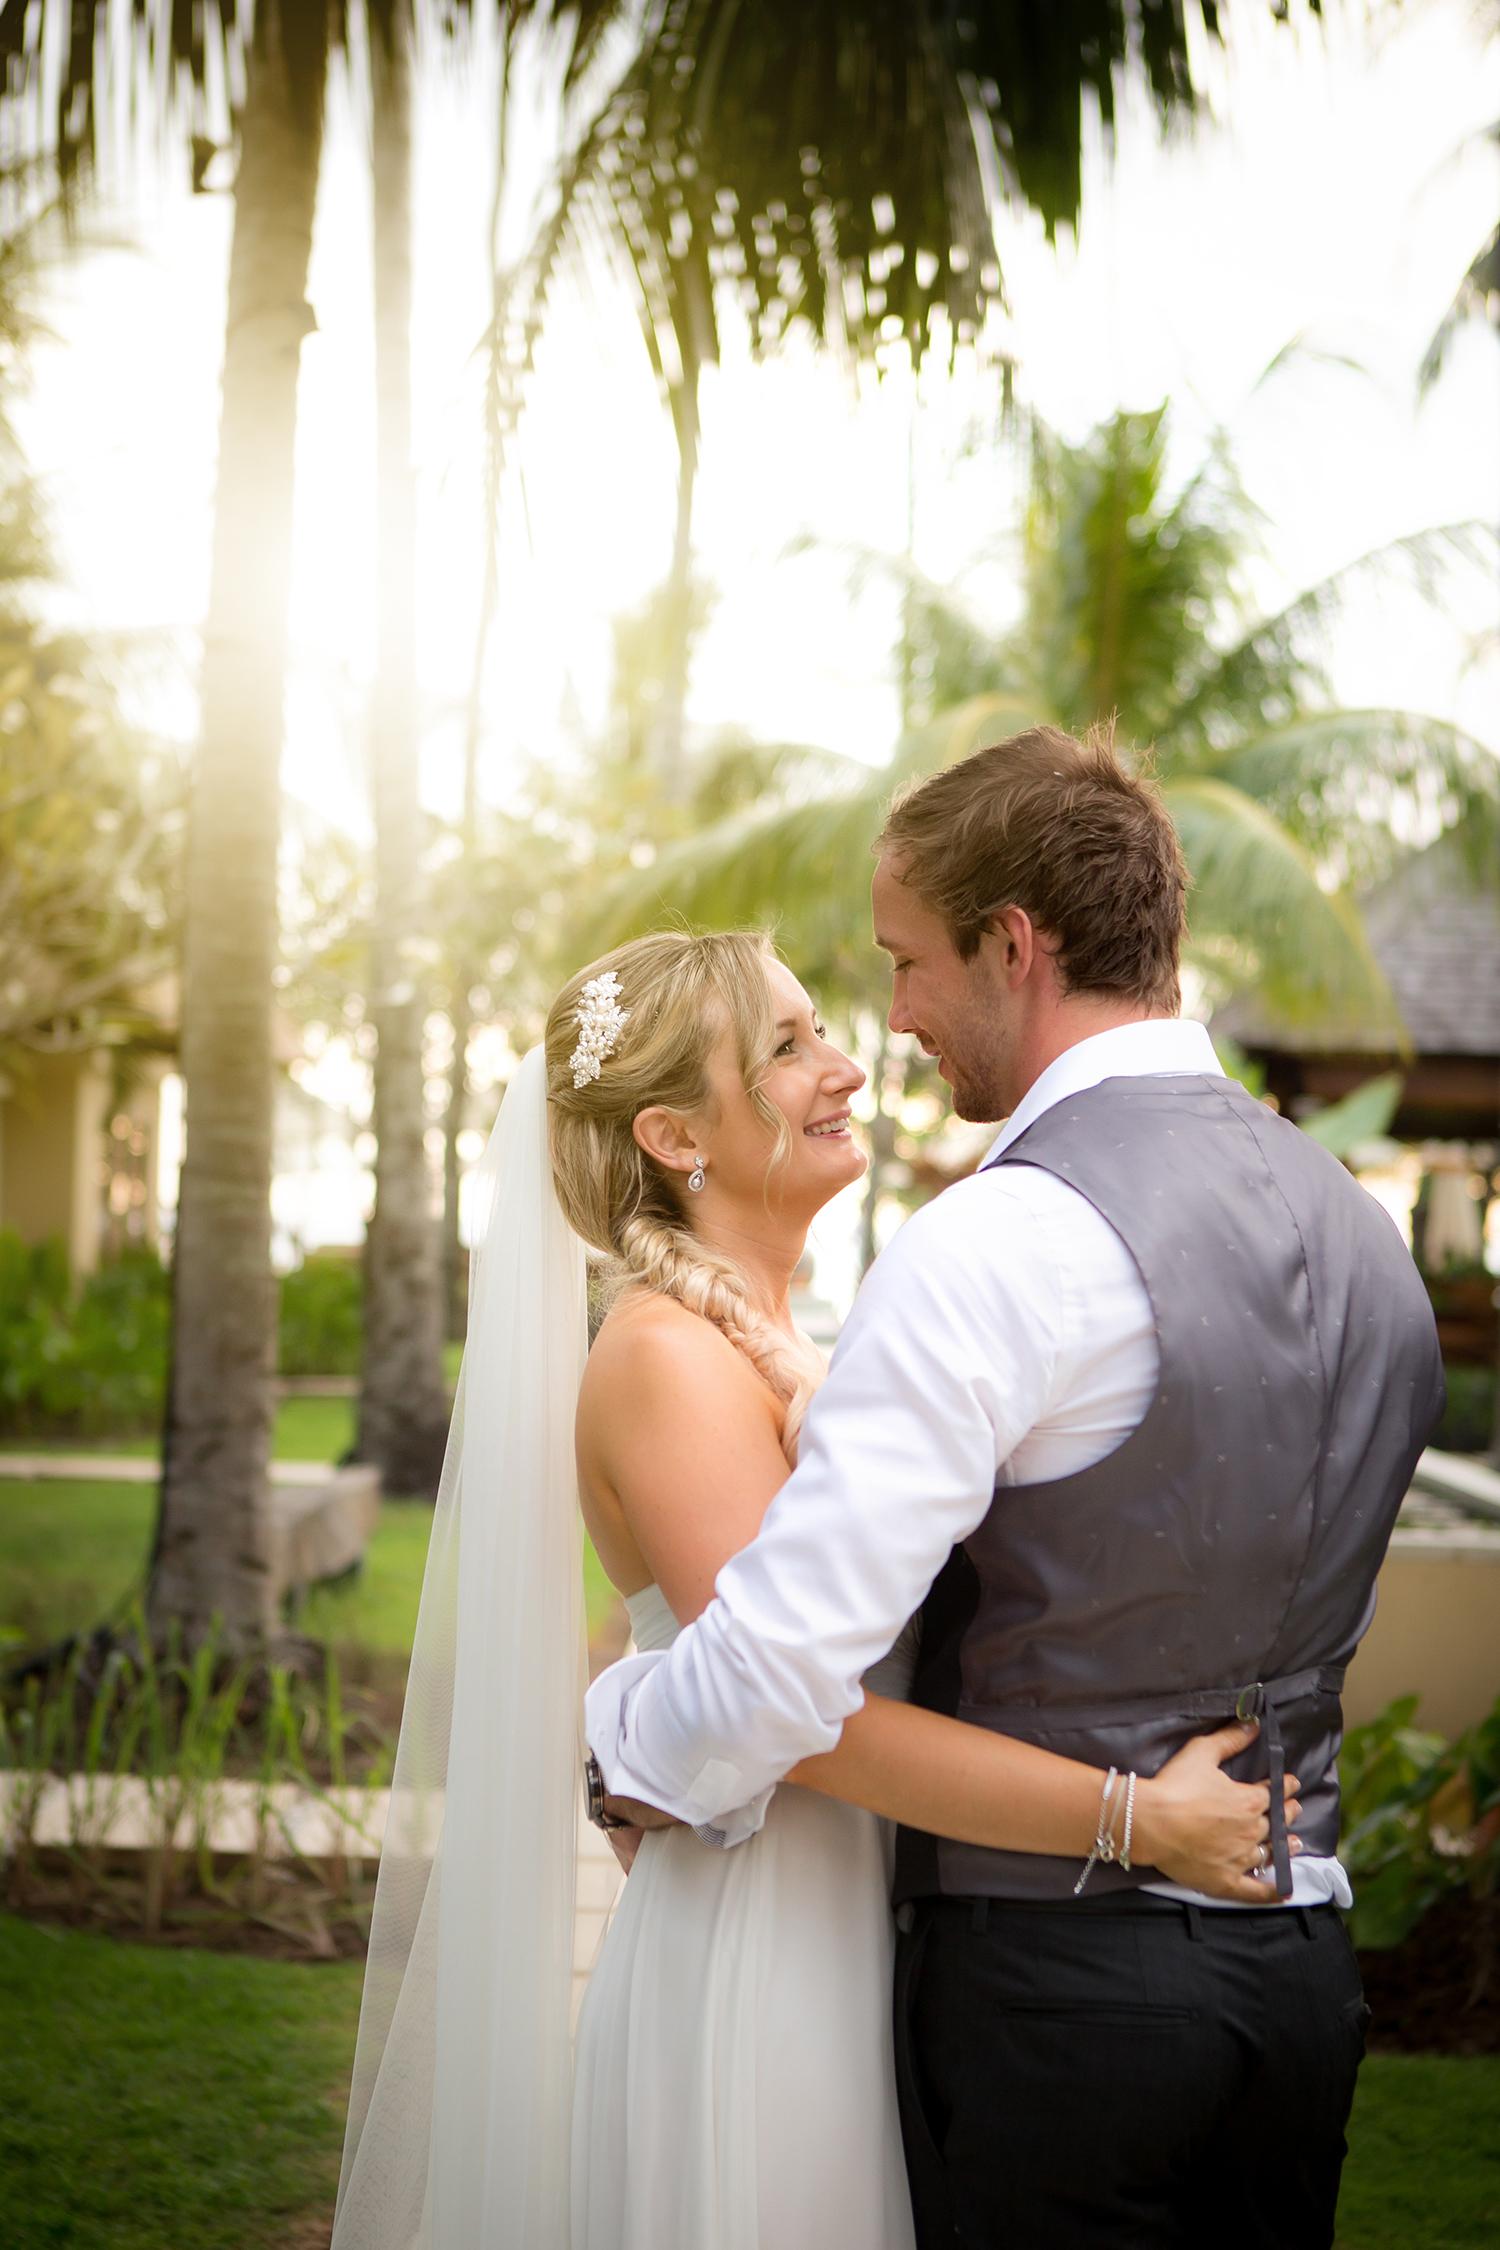 Destination wedding photography bali reception photographer lombok indonesia love hitched qunci villas (34).jpg